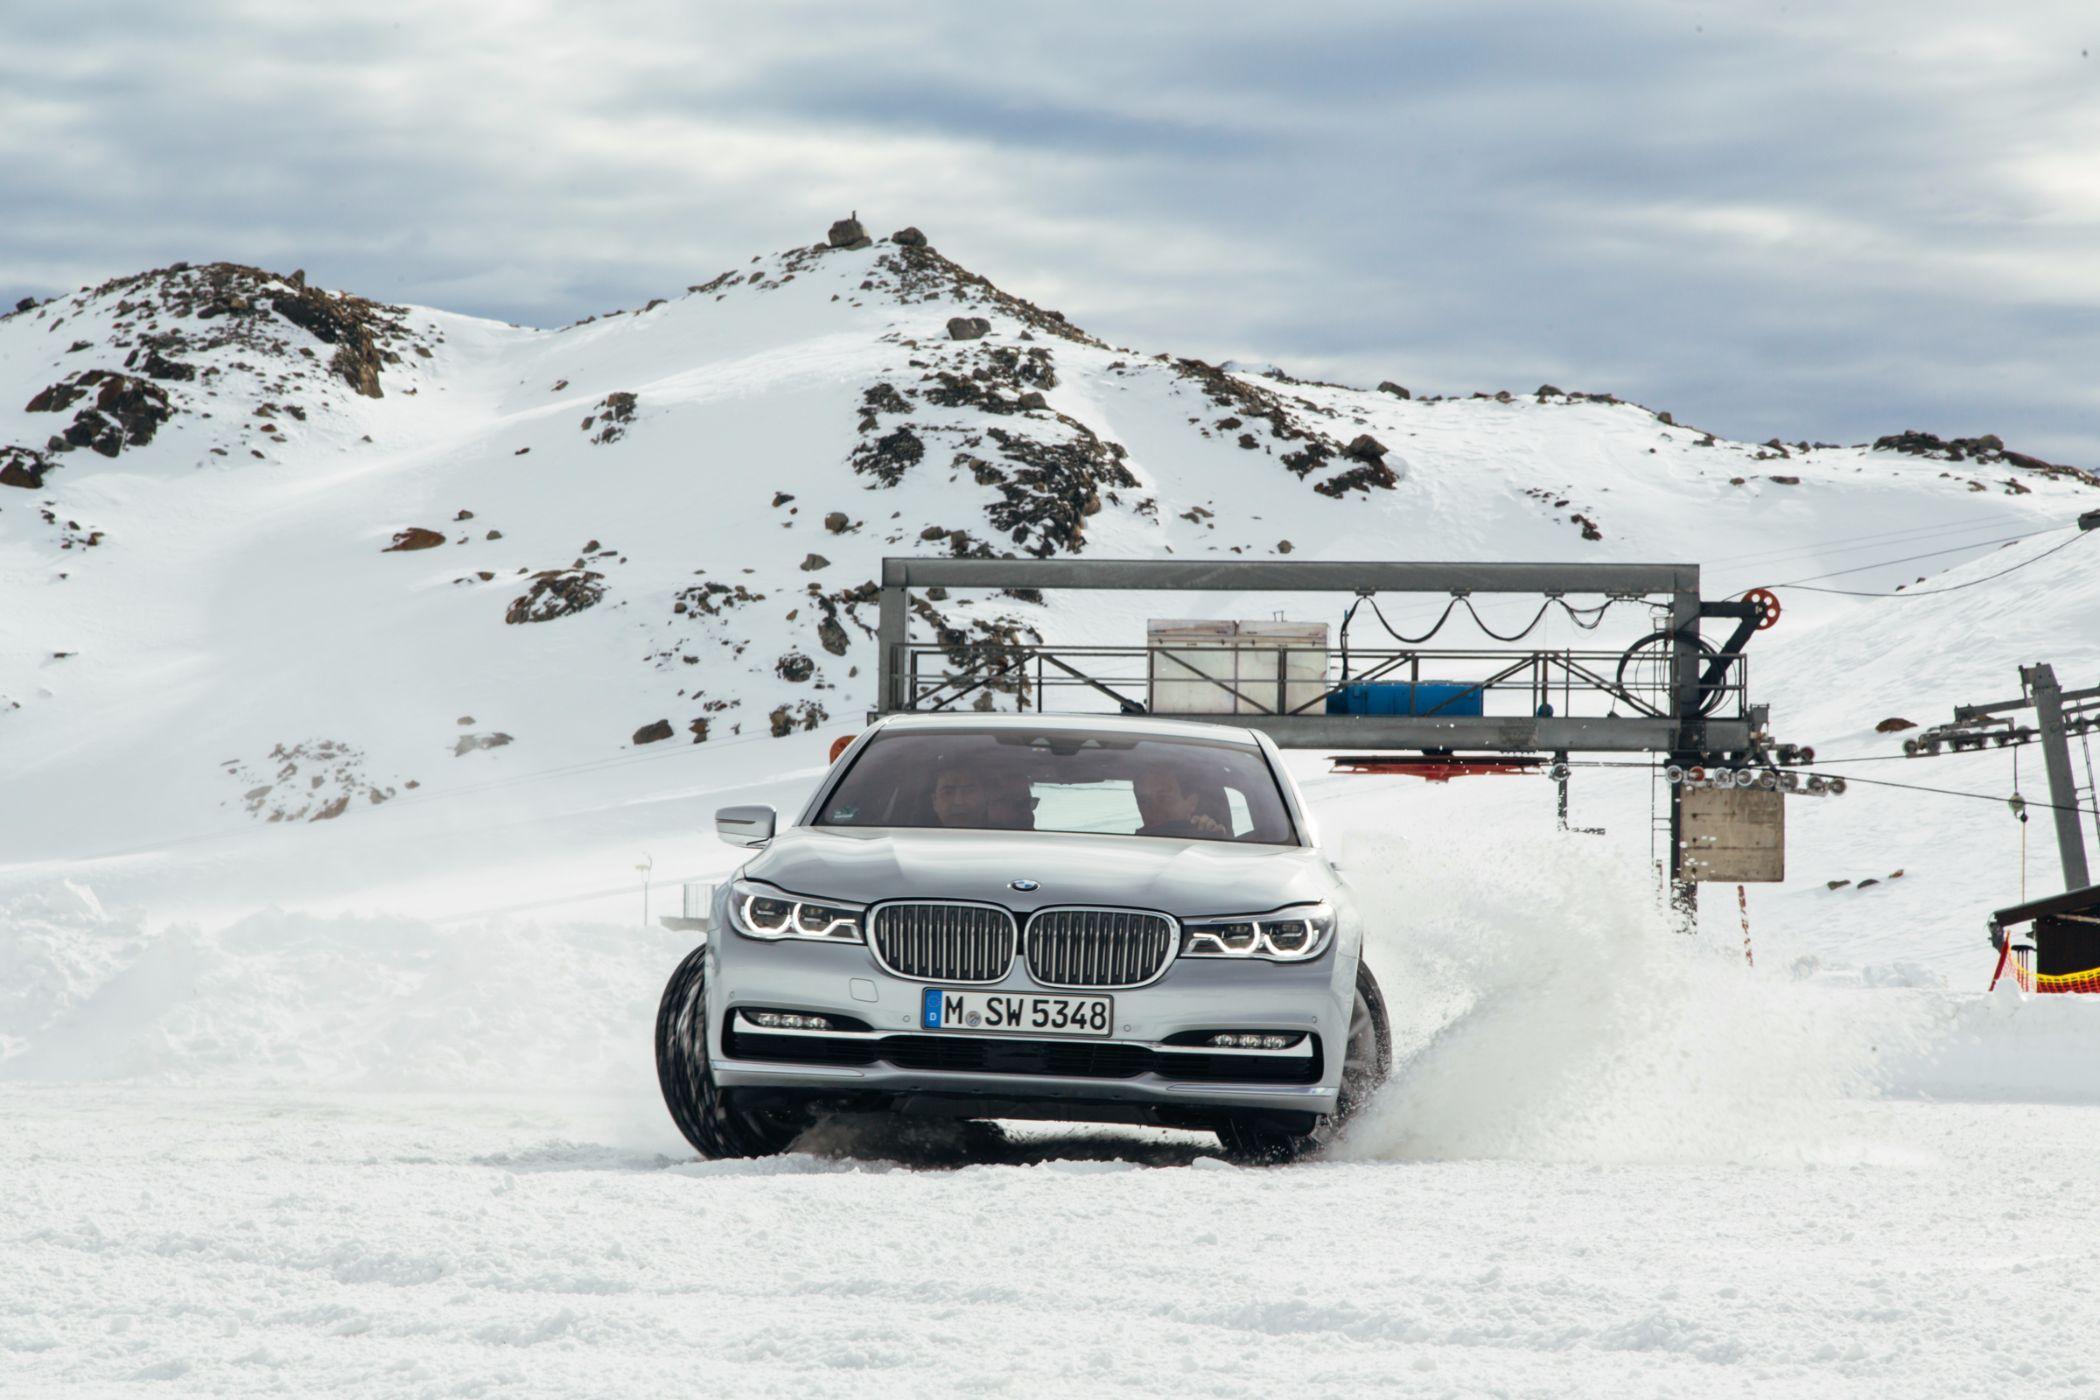 BMW Driving Experience in Sölden